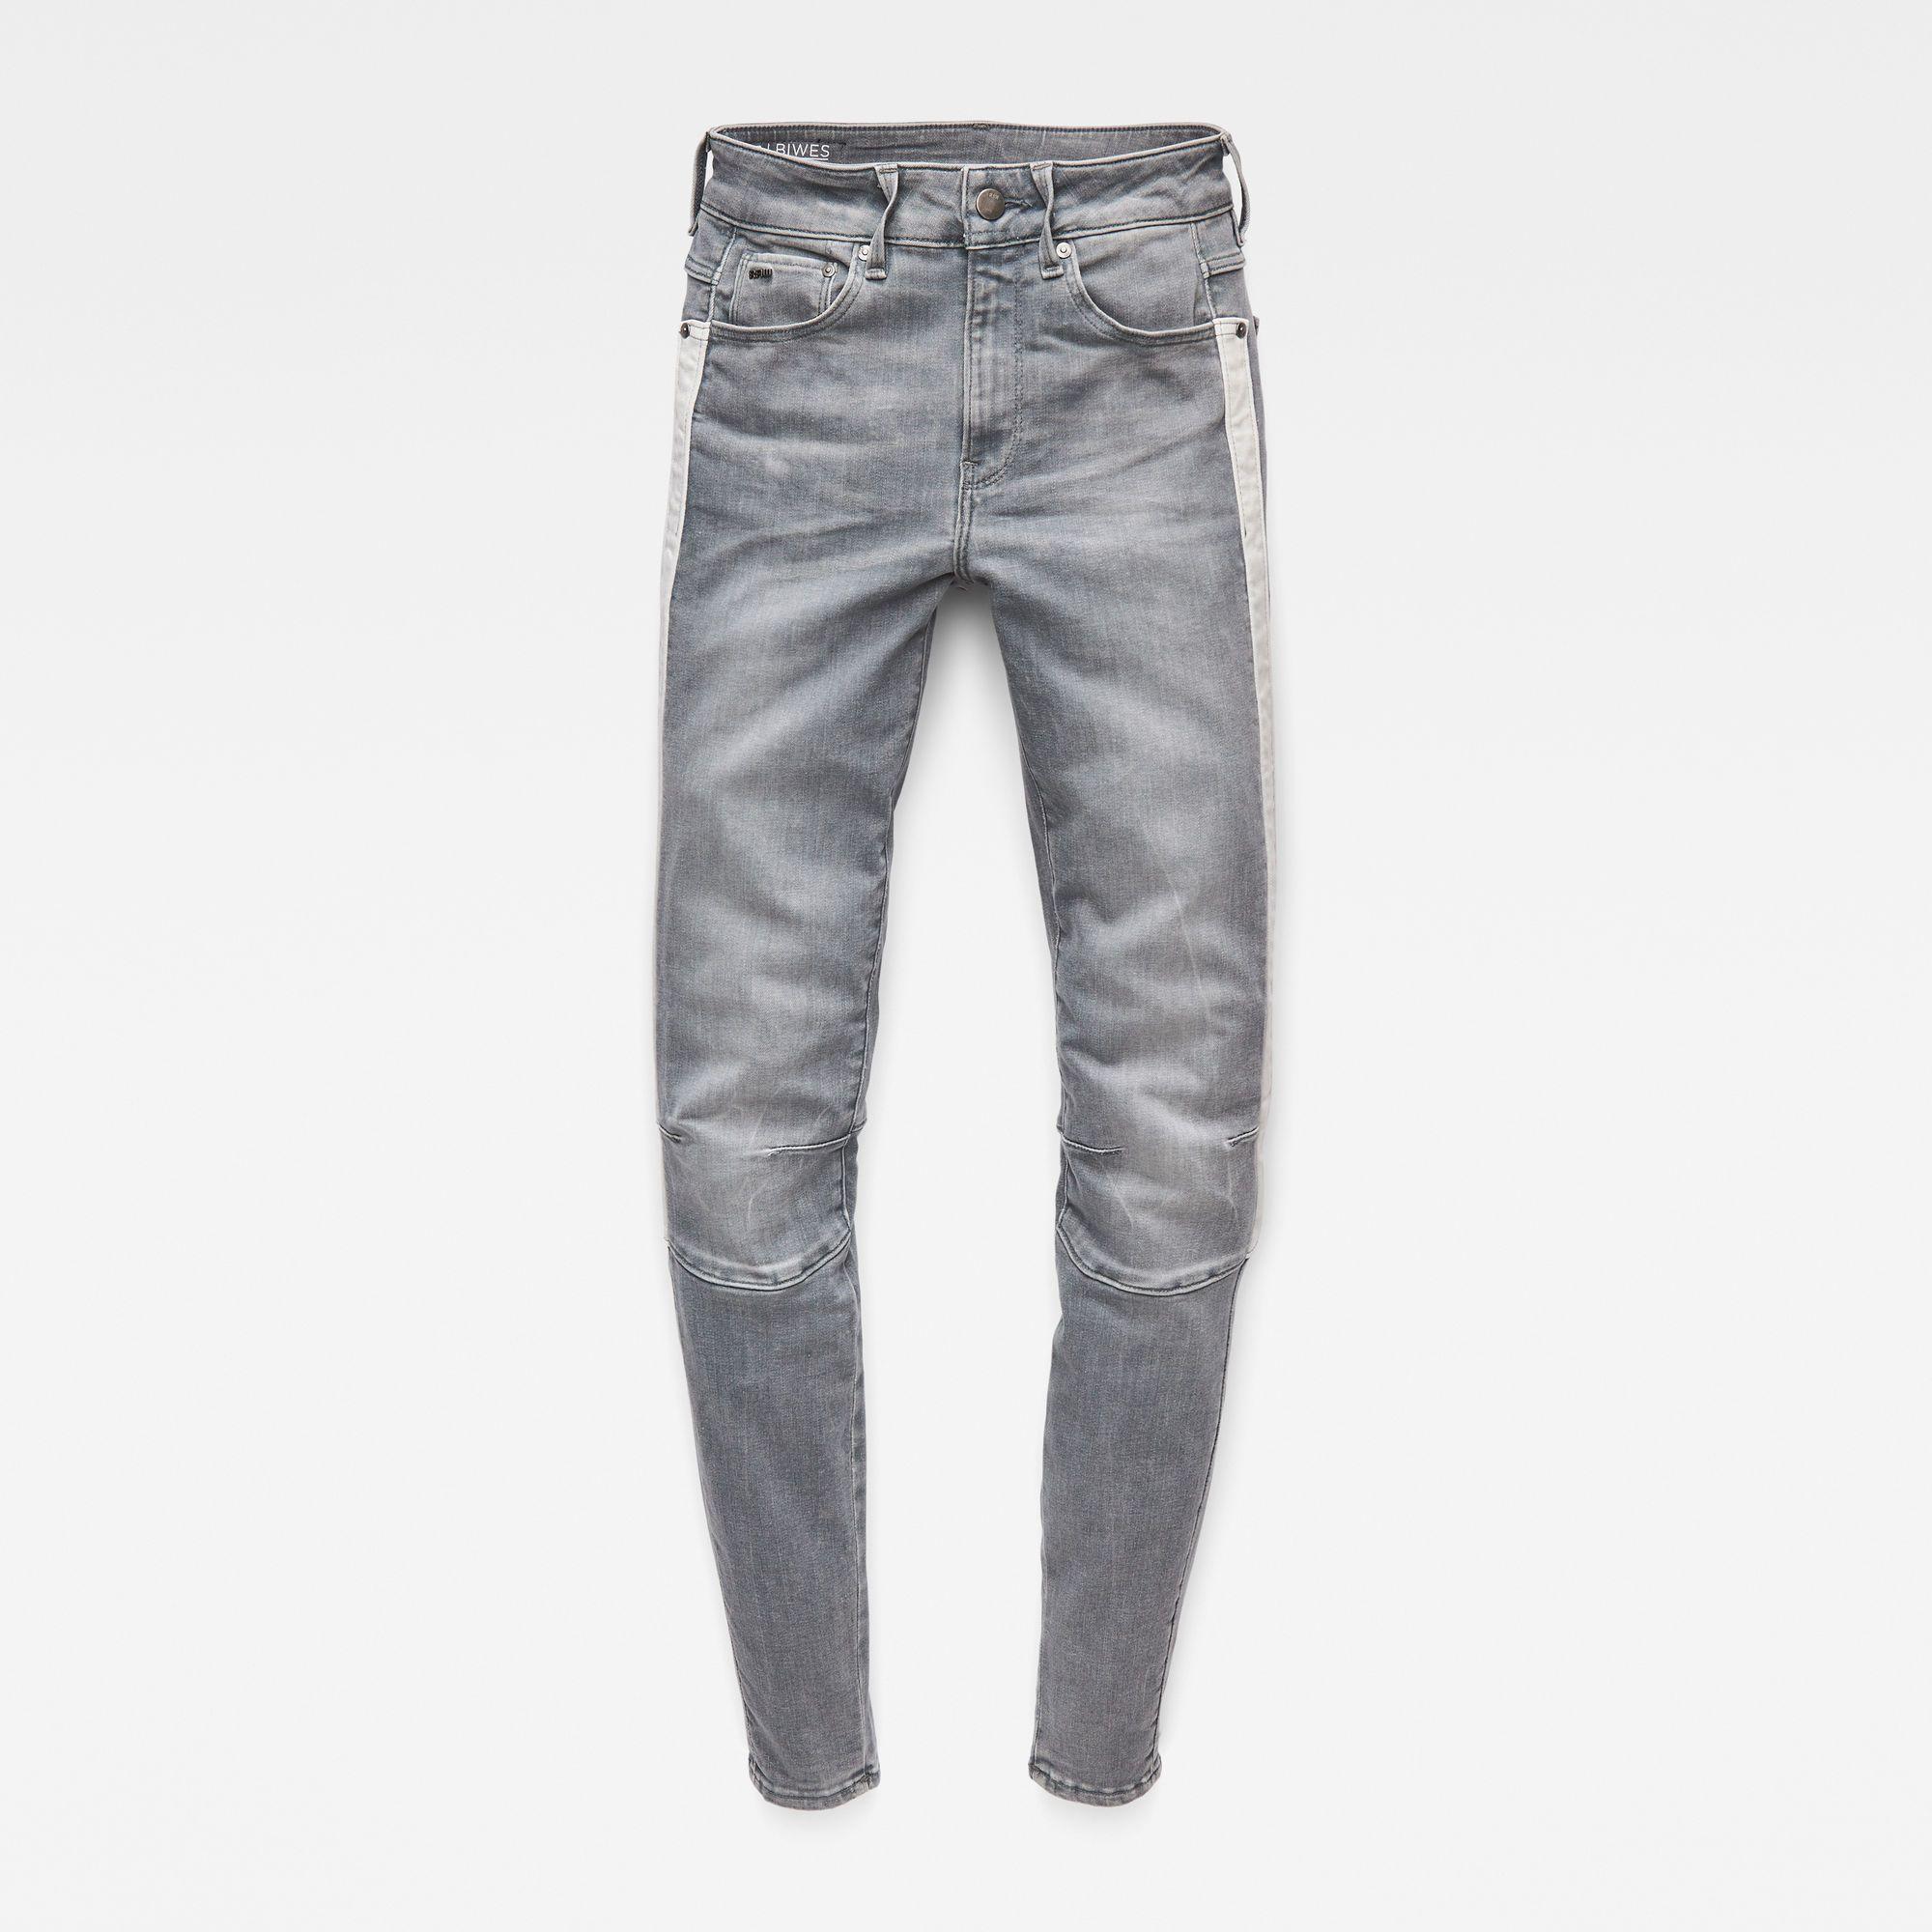 G-Star RAW Biwes Stripe High Skinny Jeans